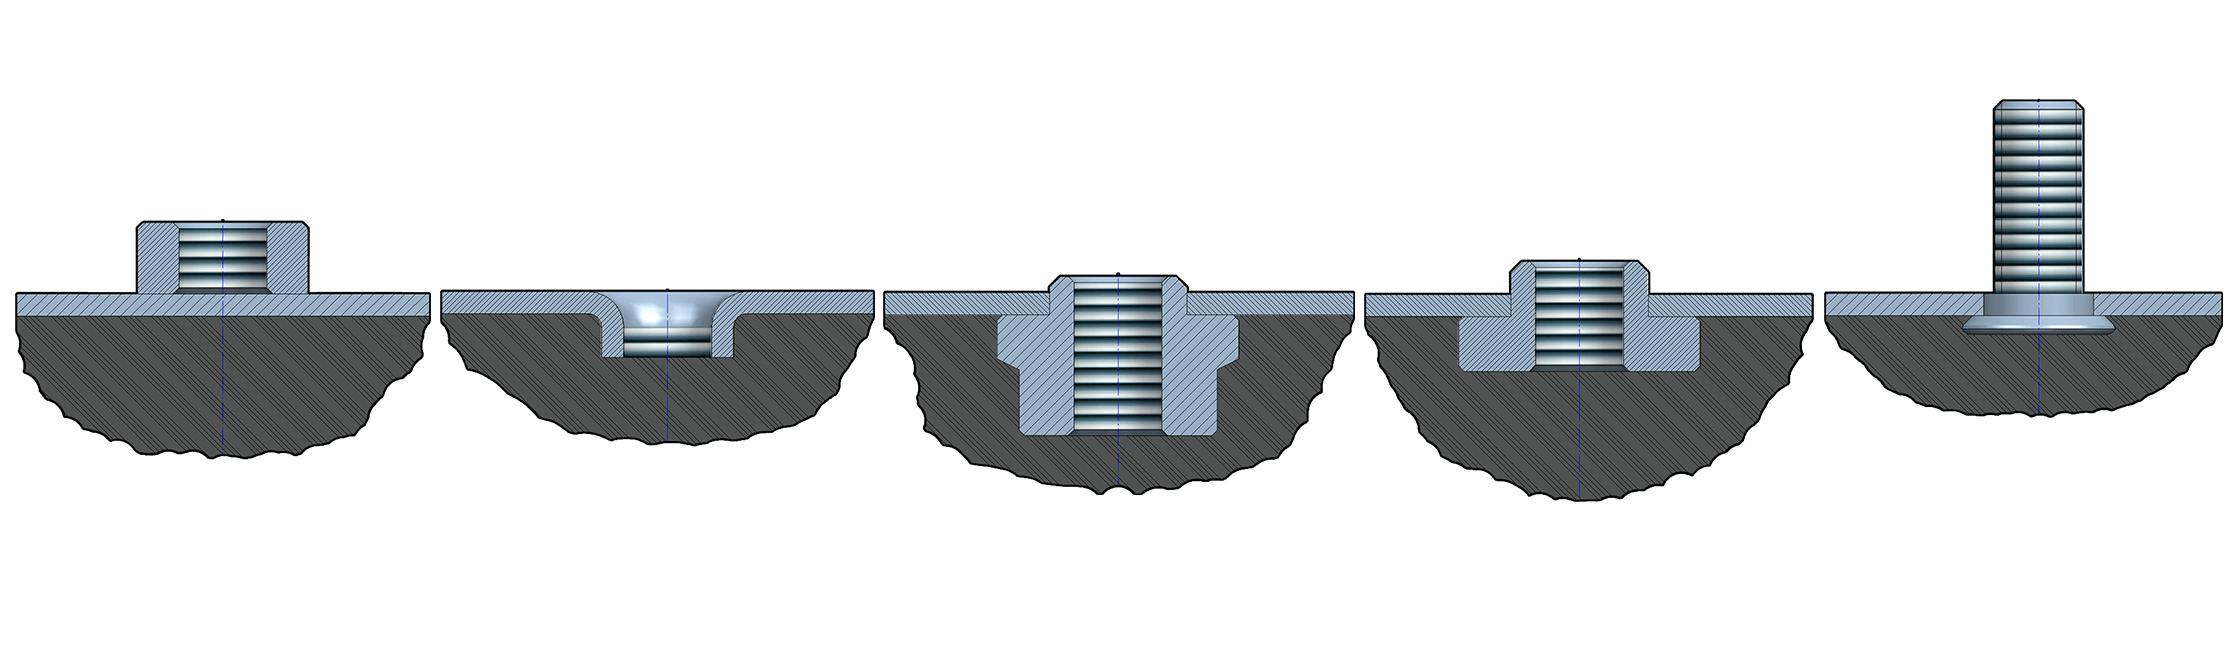 rubber-mounts-design-1.png